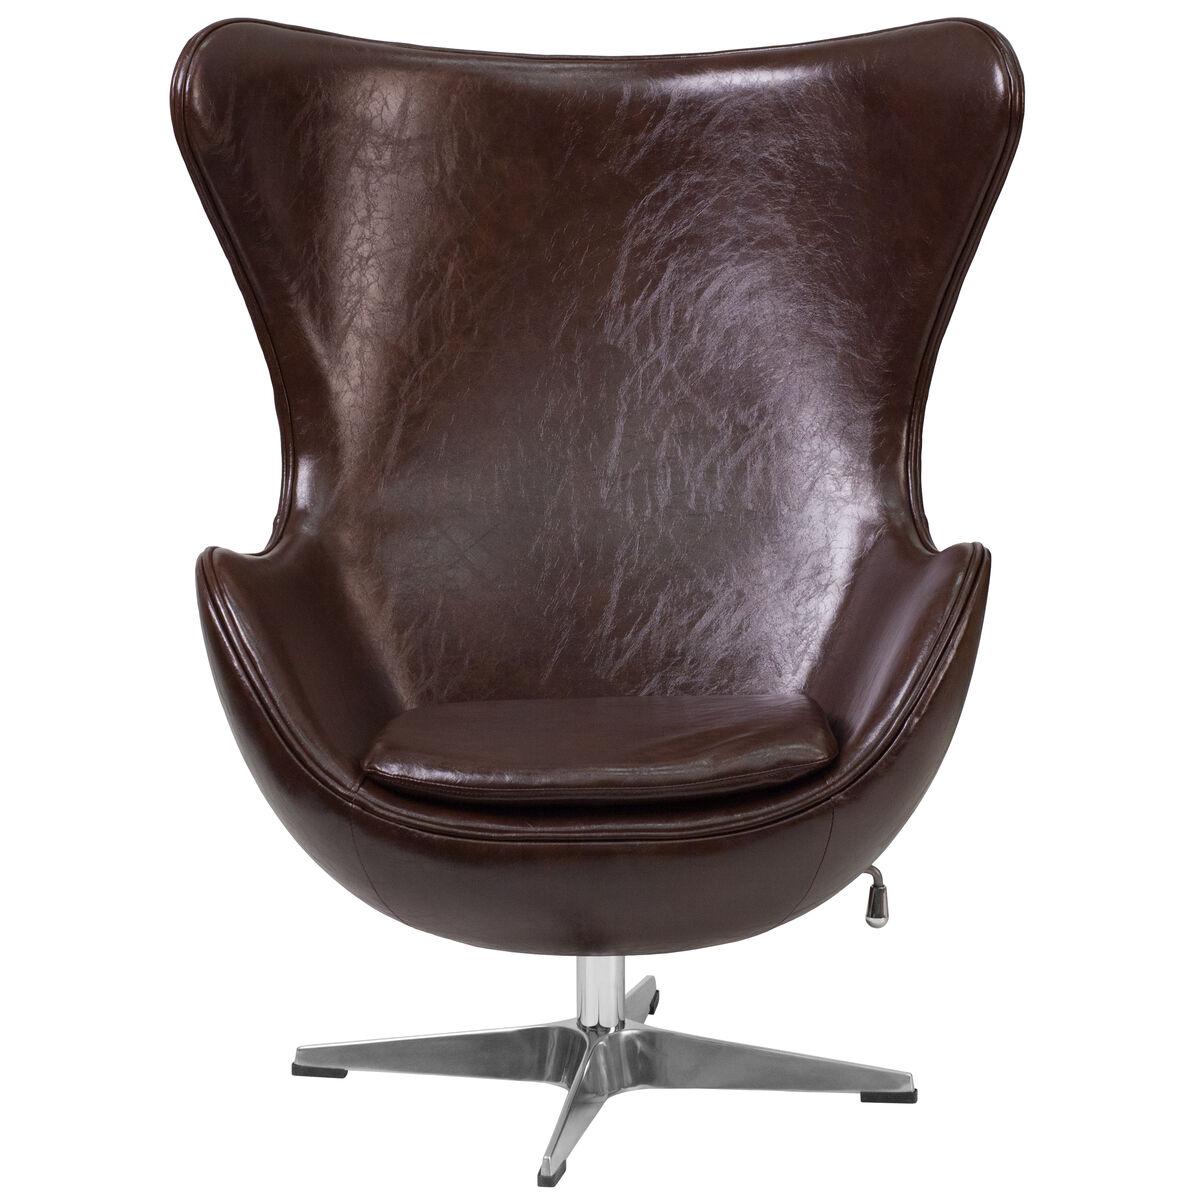 Superb Brown Leather Egg Chair With Tilt Lock Mechanism Ibusinesslaw Wood Chair Design Ideas Ibusinesslaworg